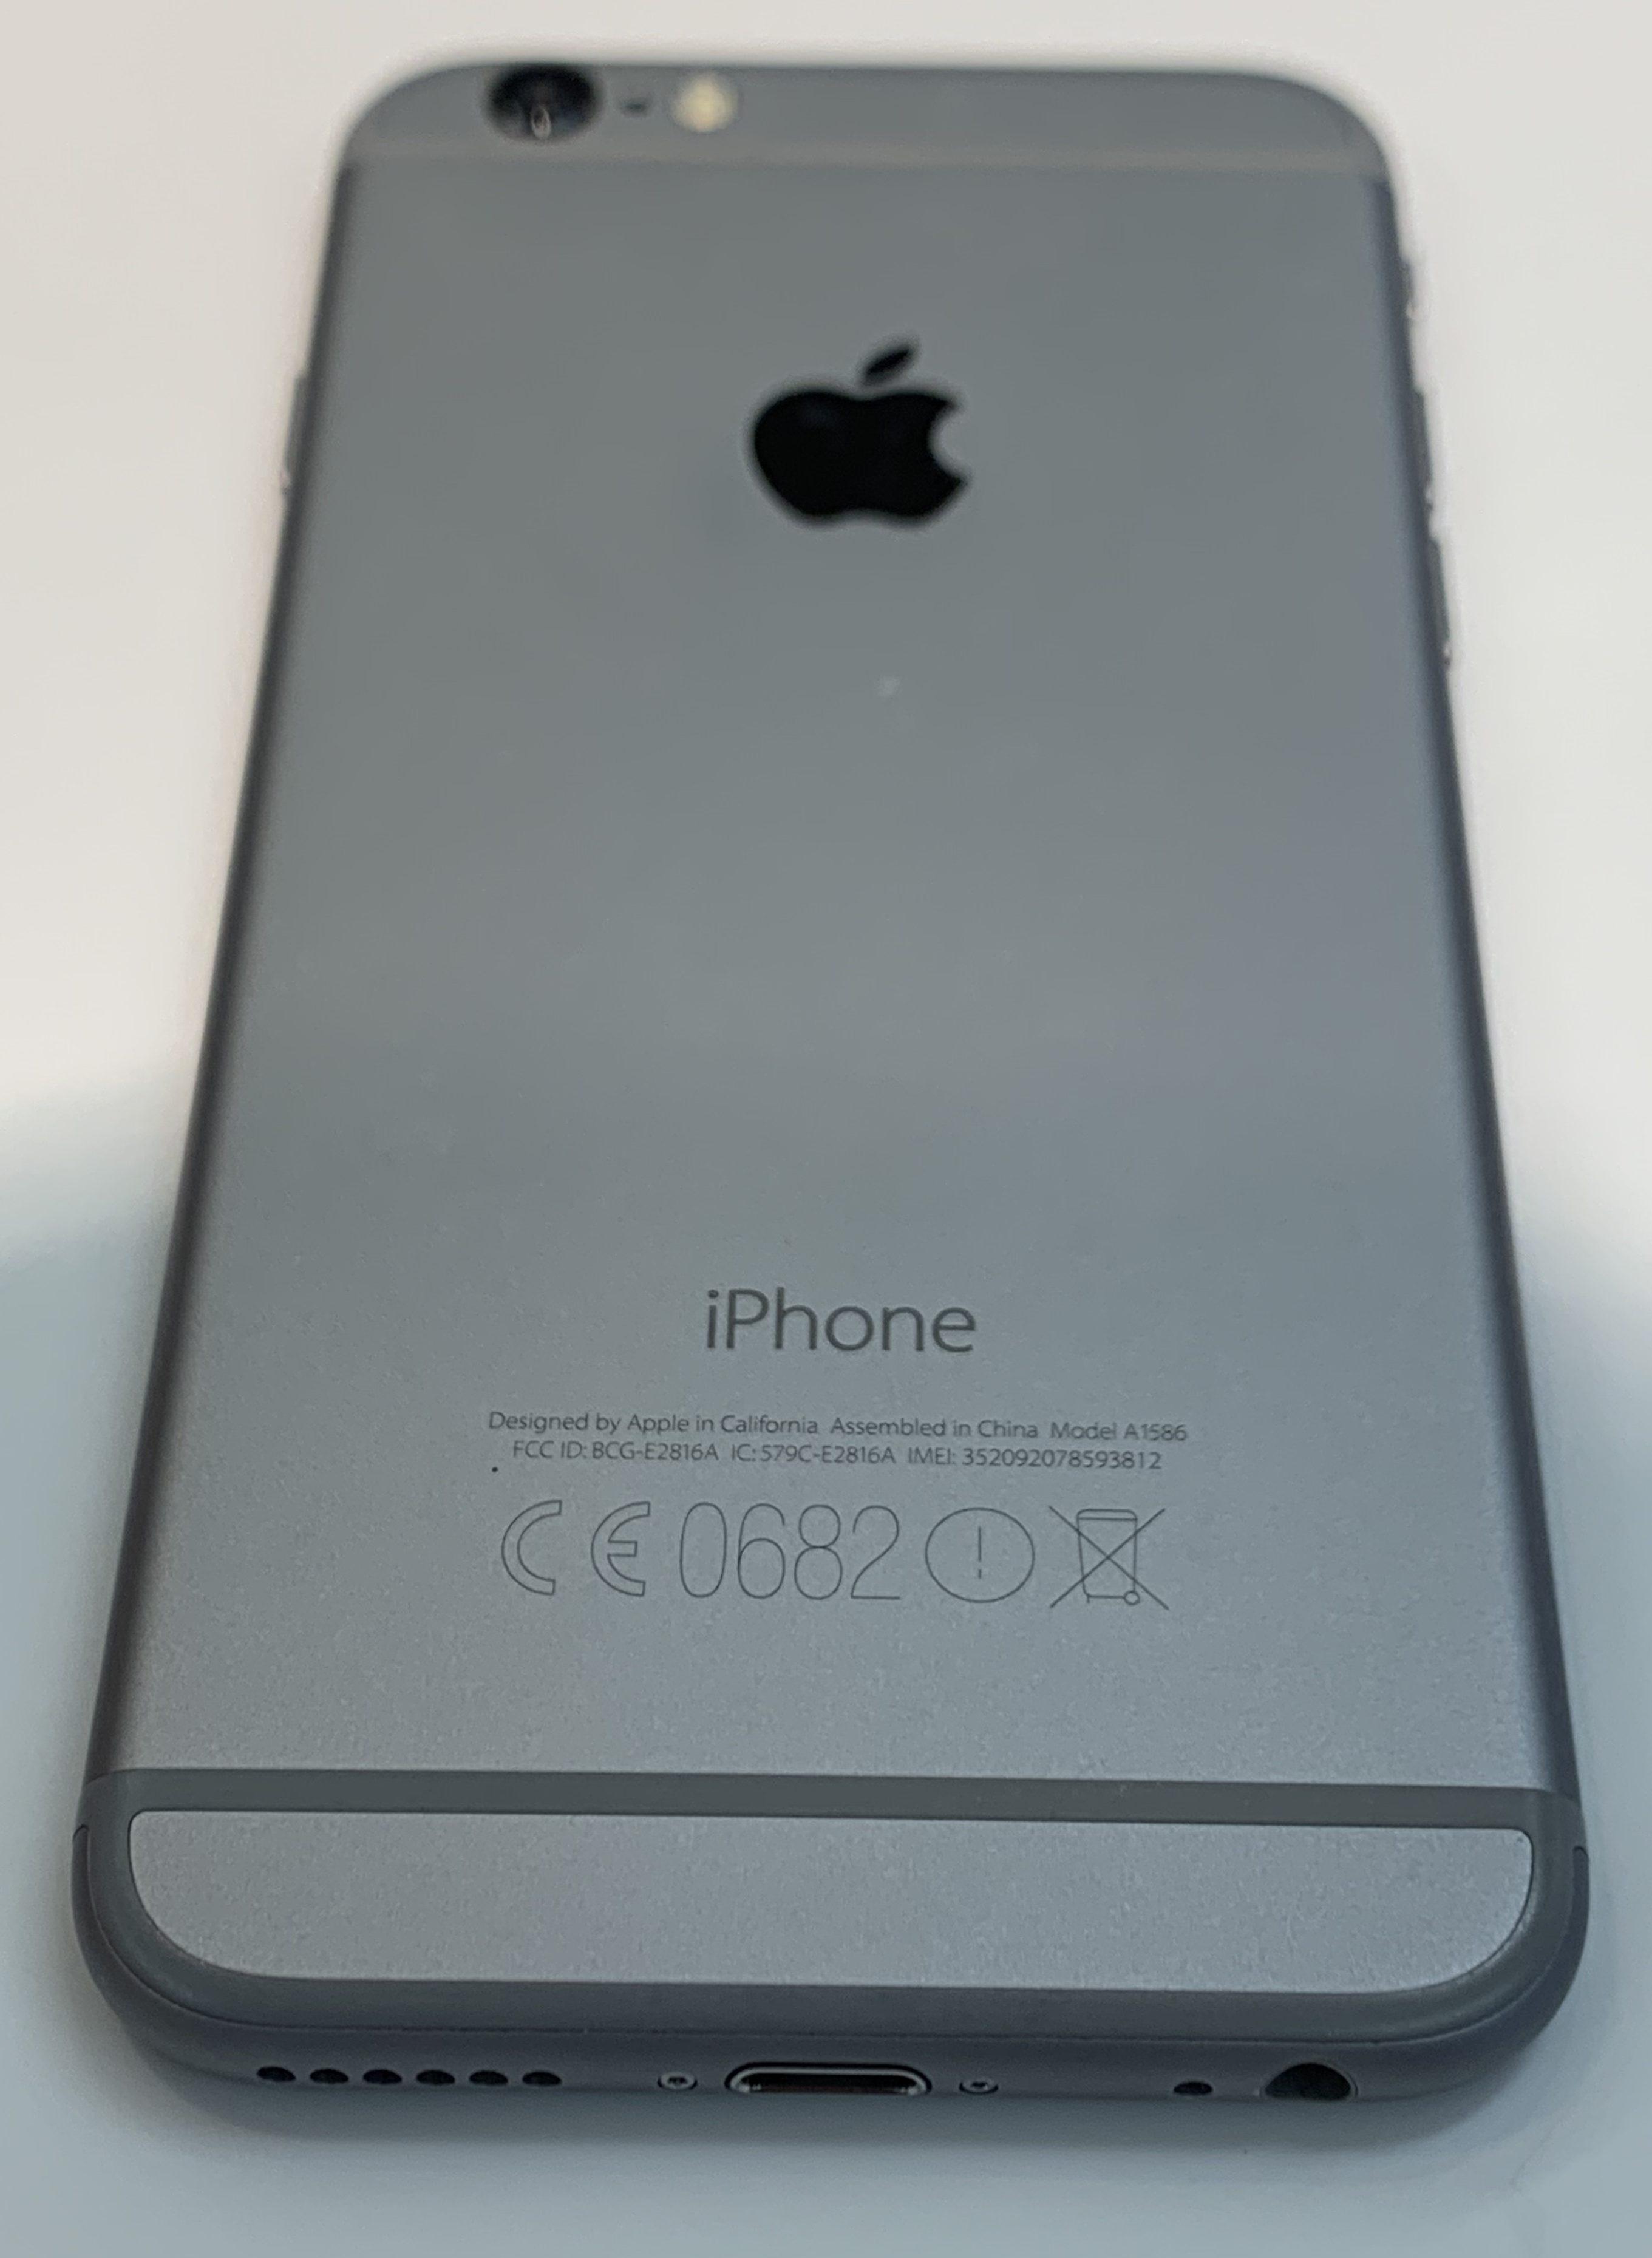 iPhone 6 16GB, 16 GB, Space Gray, bild 2